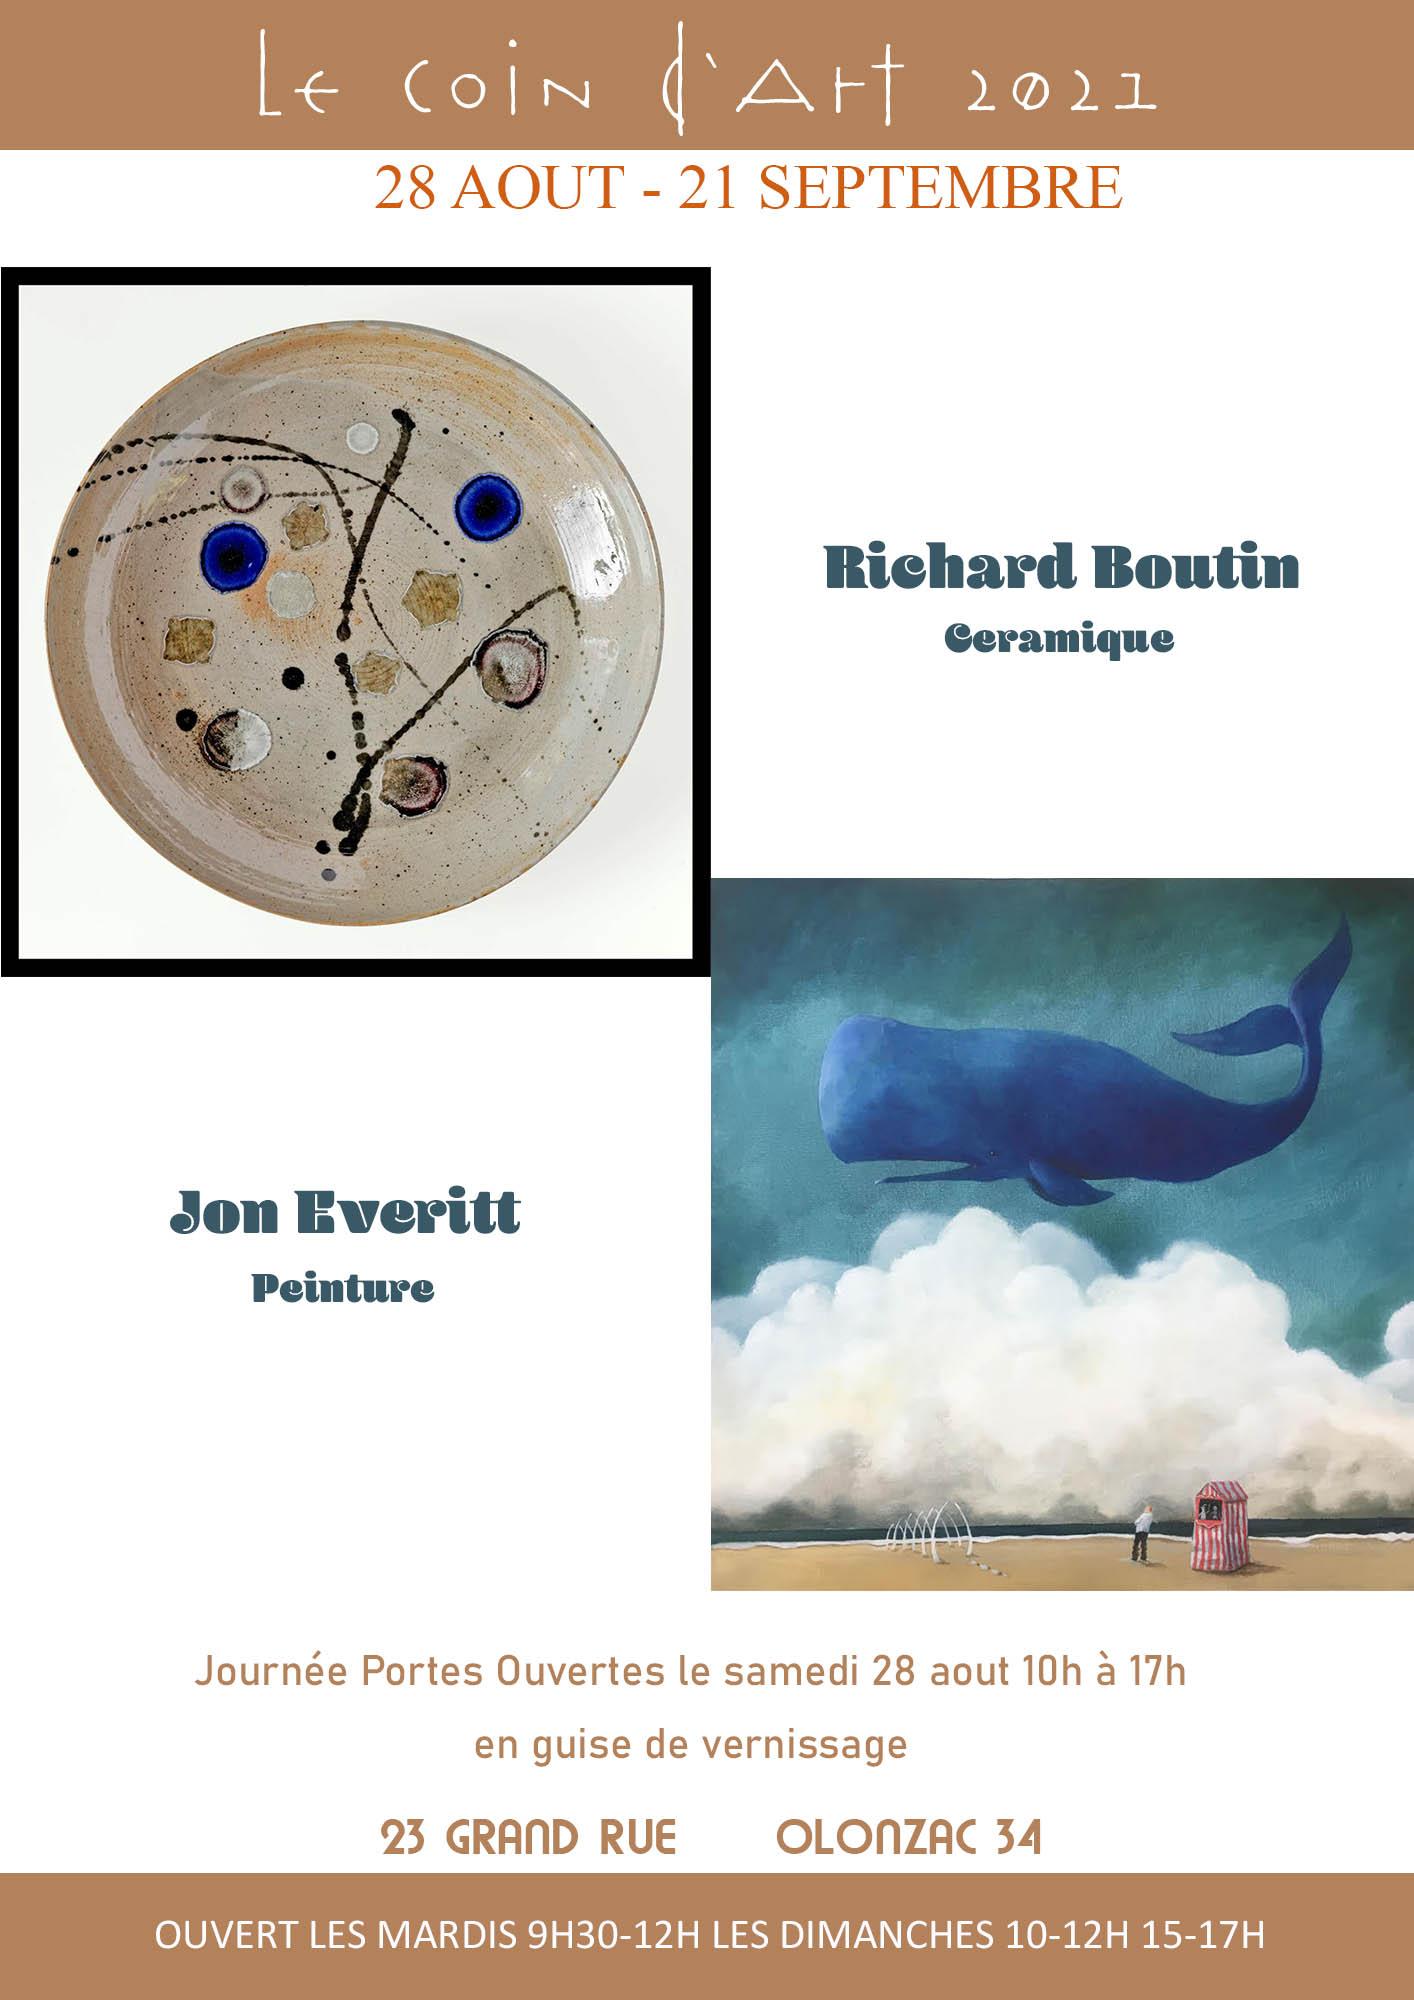 Richard Boutin & Jon Everitt, exposition au Coin d'Art